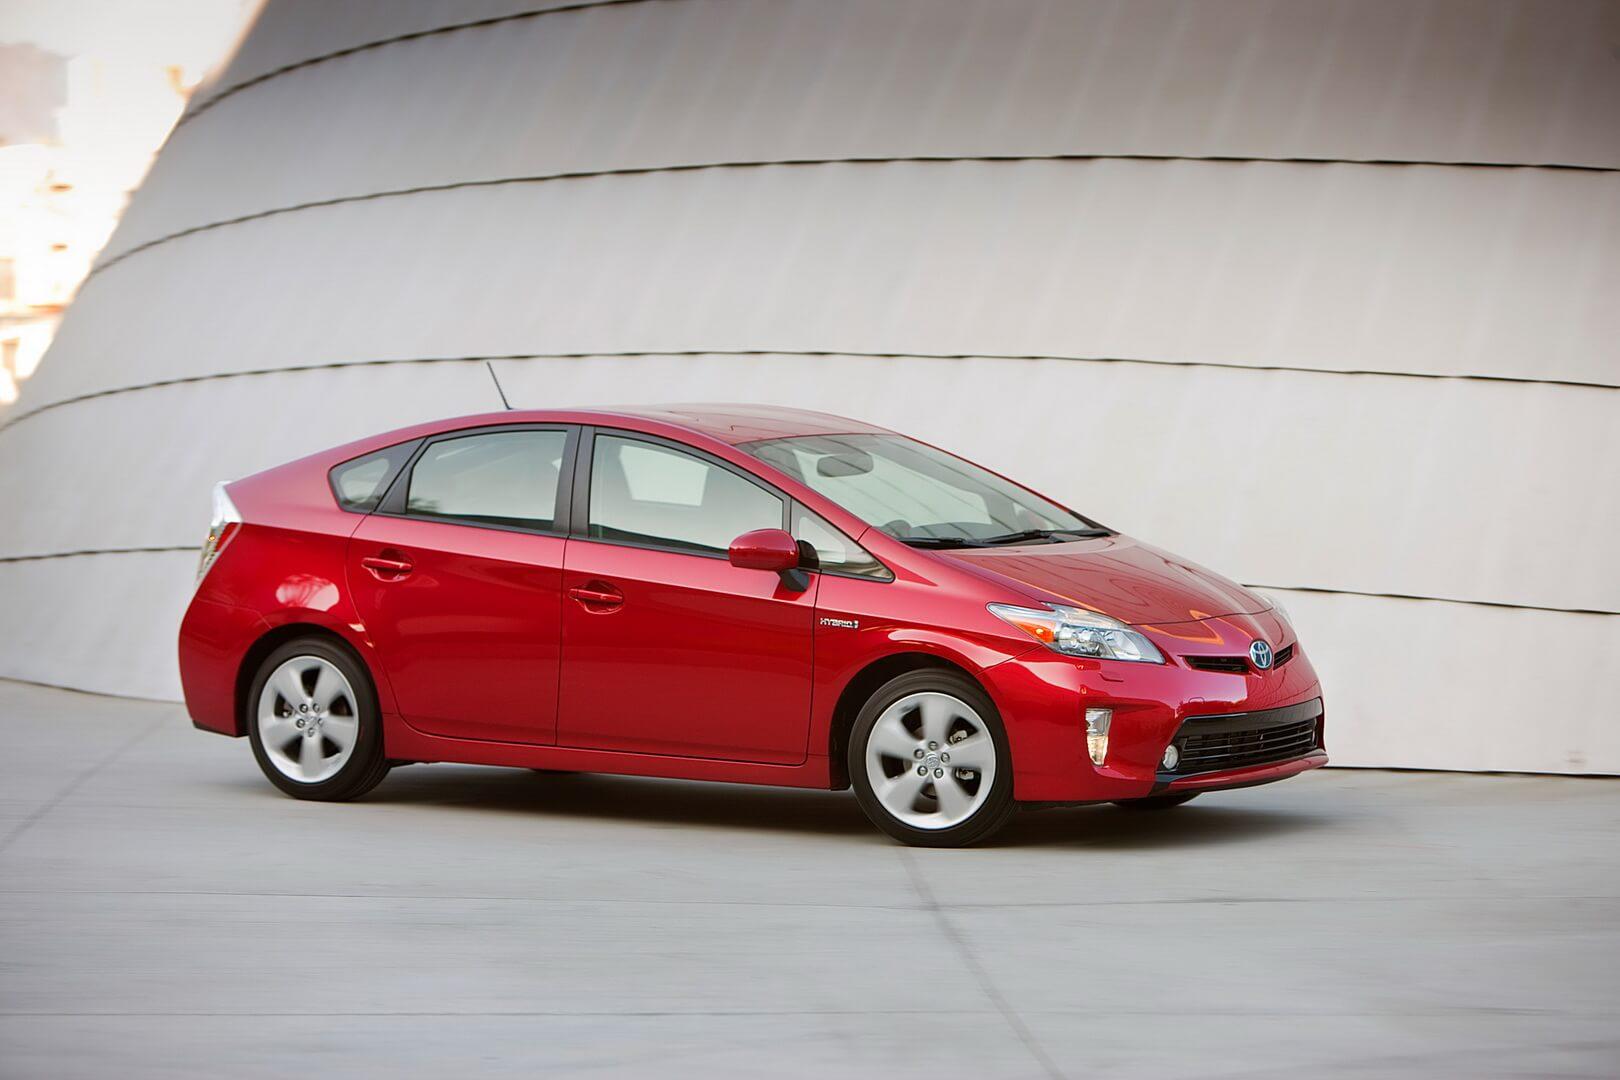 toyota-prius-hybrid-2012-2015-exterior-hevcars-ap